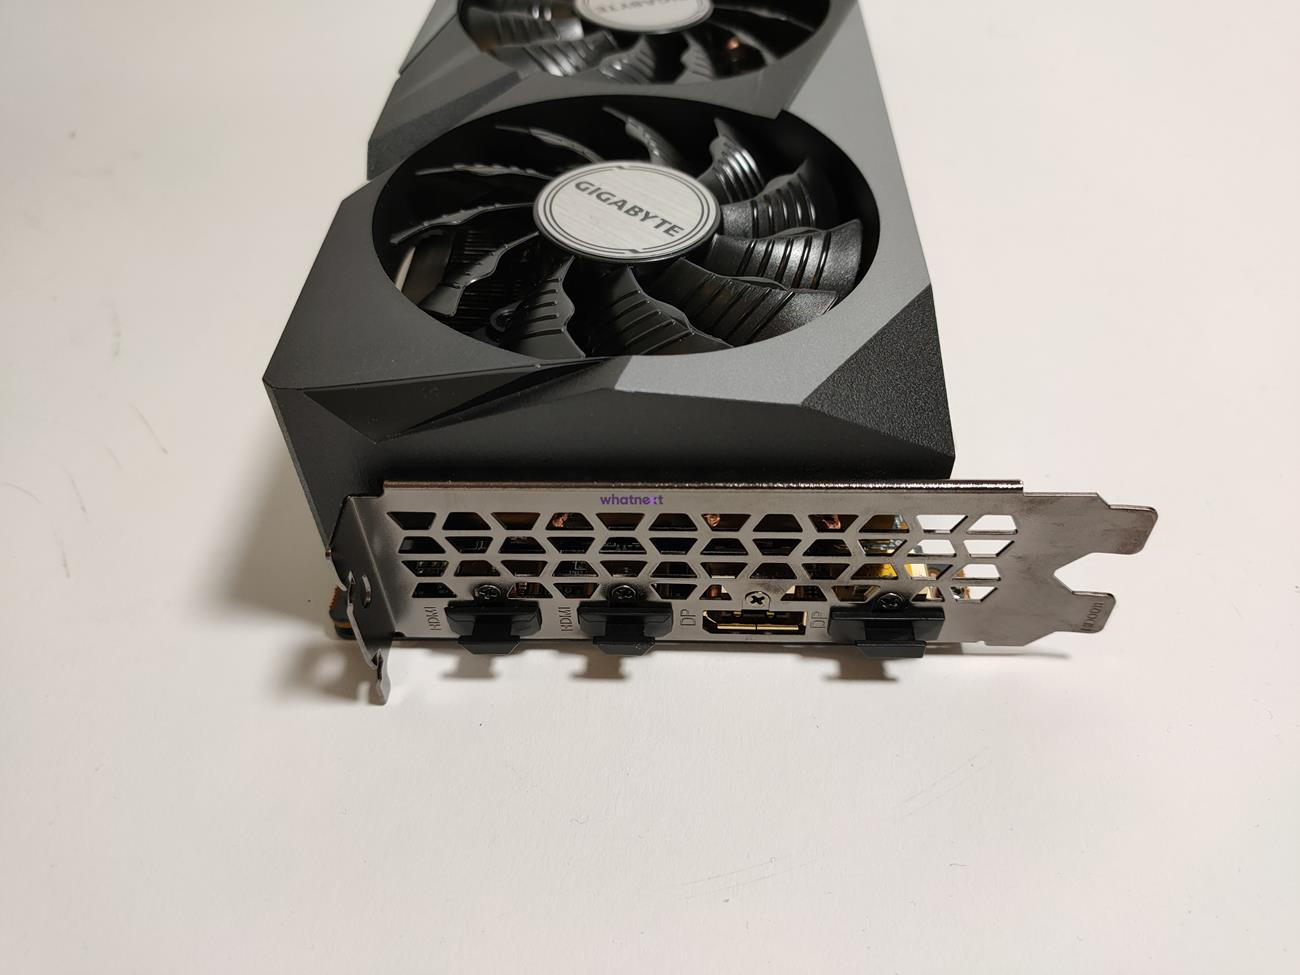 test Gigabyte Radeon RX 6800 XT GAMING OC 16G, recenzja Gigabyte Radeon RX 6800 XT GAMING OC 16G, opinia Gigabyte Radeon RX 6800 XT GAMING OC 16G